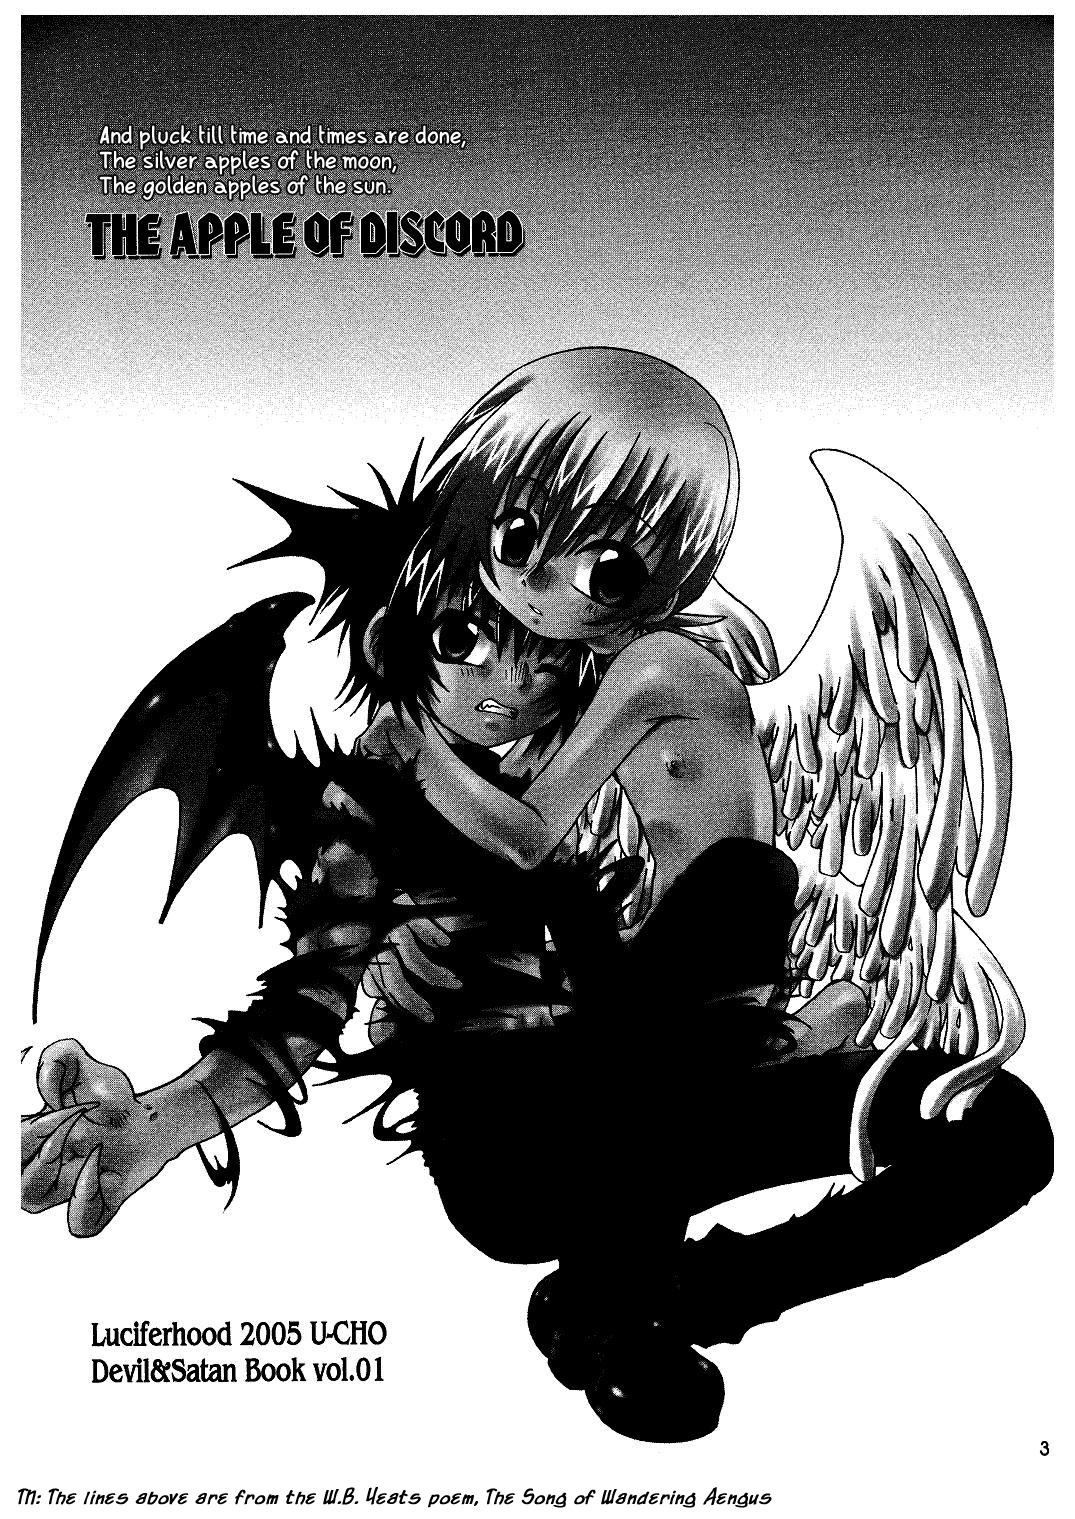 Ougon no Ringo - The Apple of Discord 1